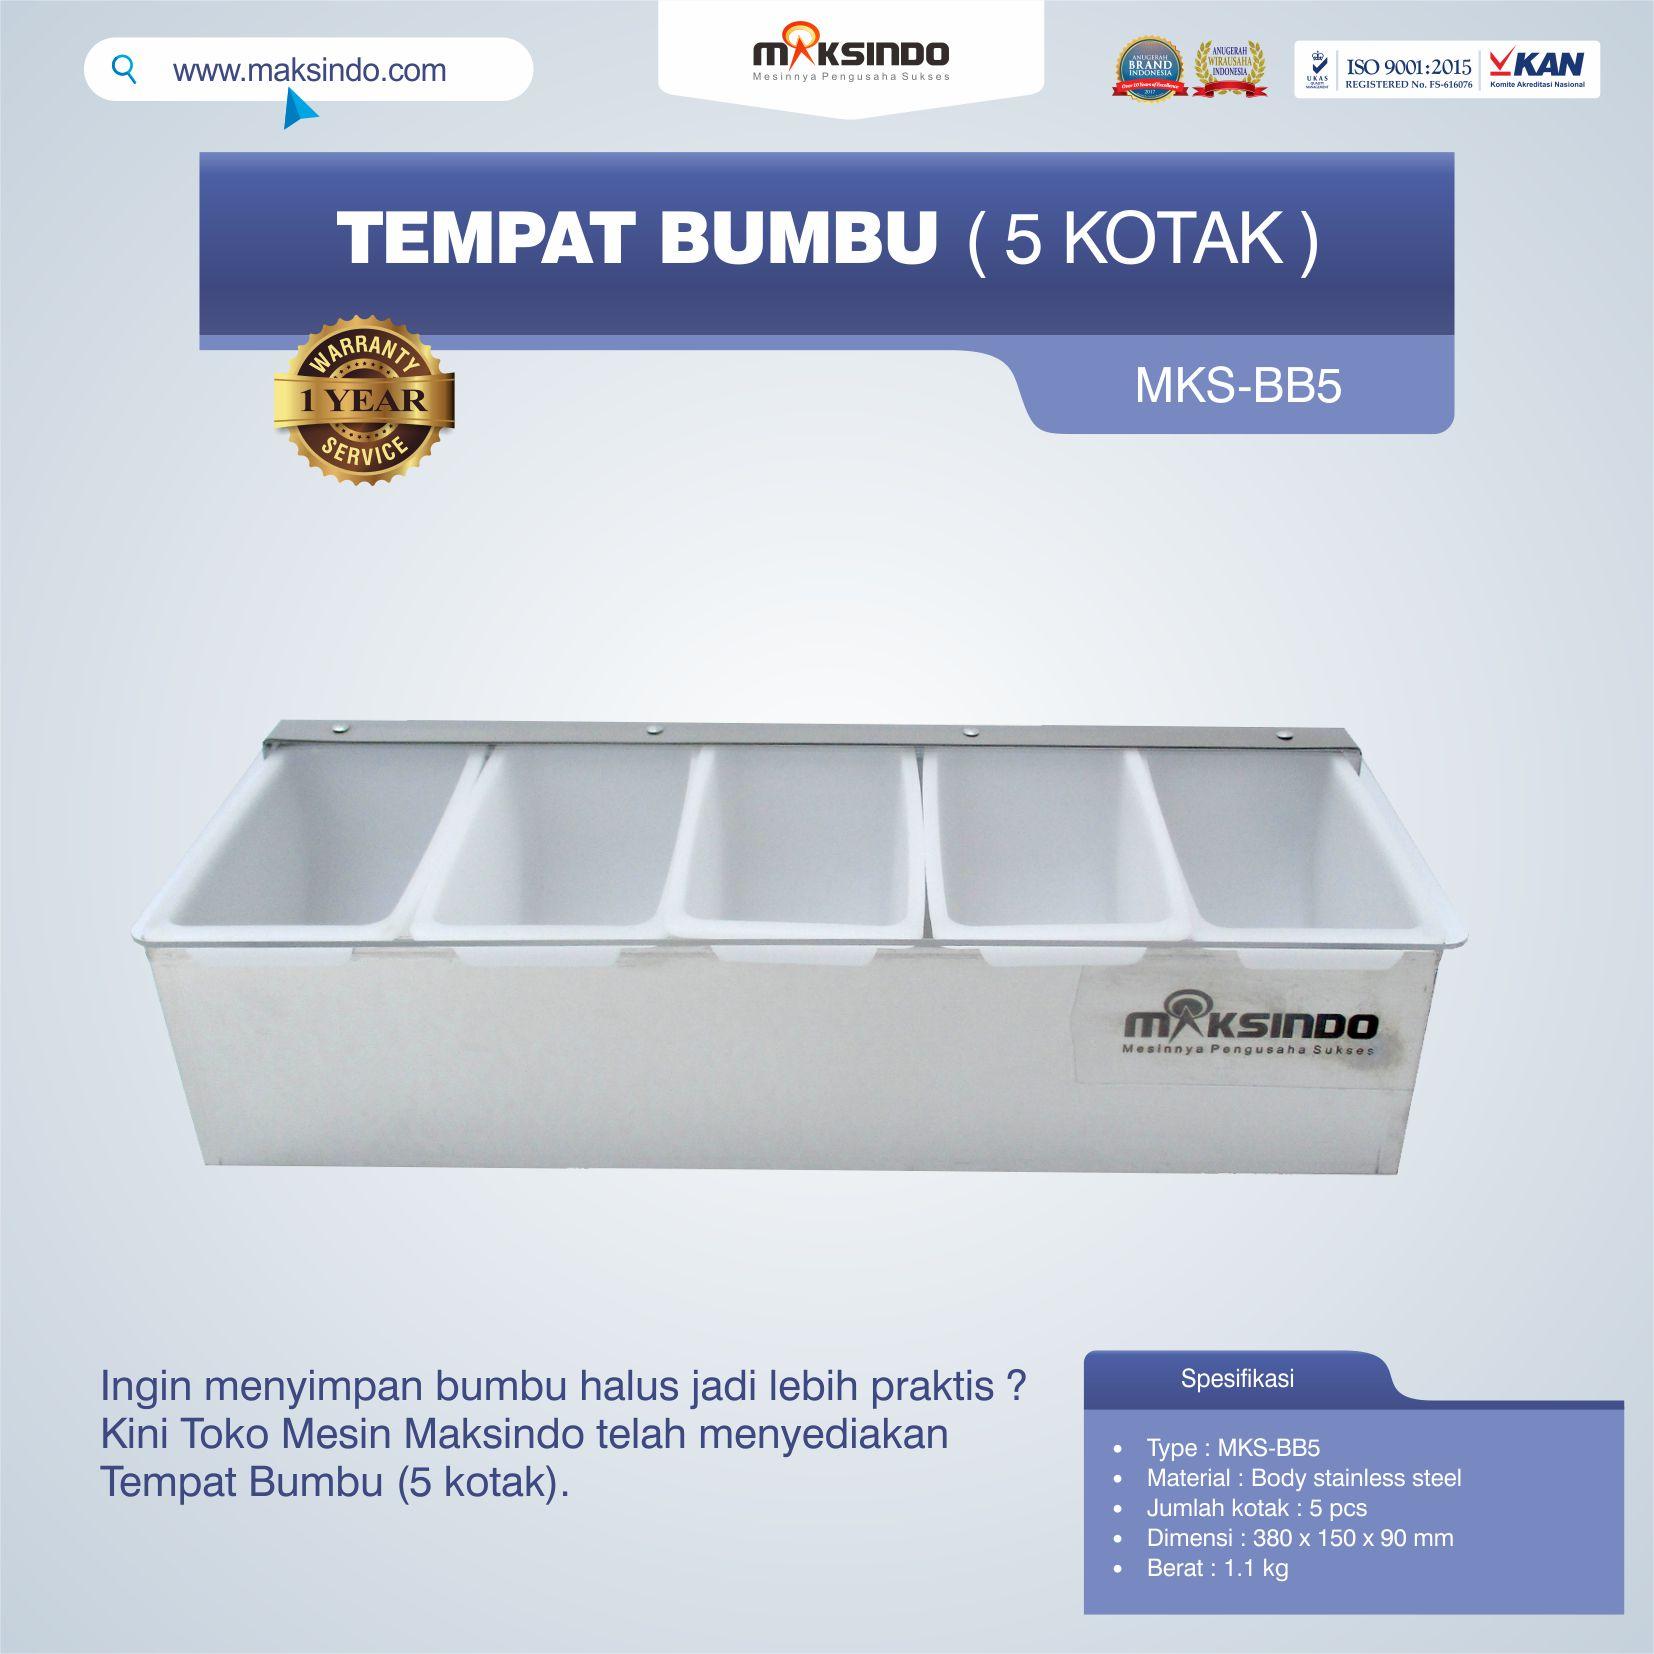 Jual Tempat Bumbu (5 kotak) di Jakarta